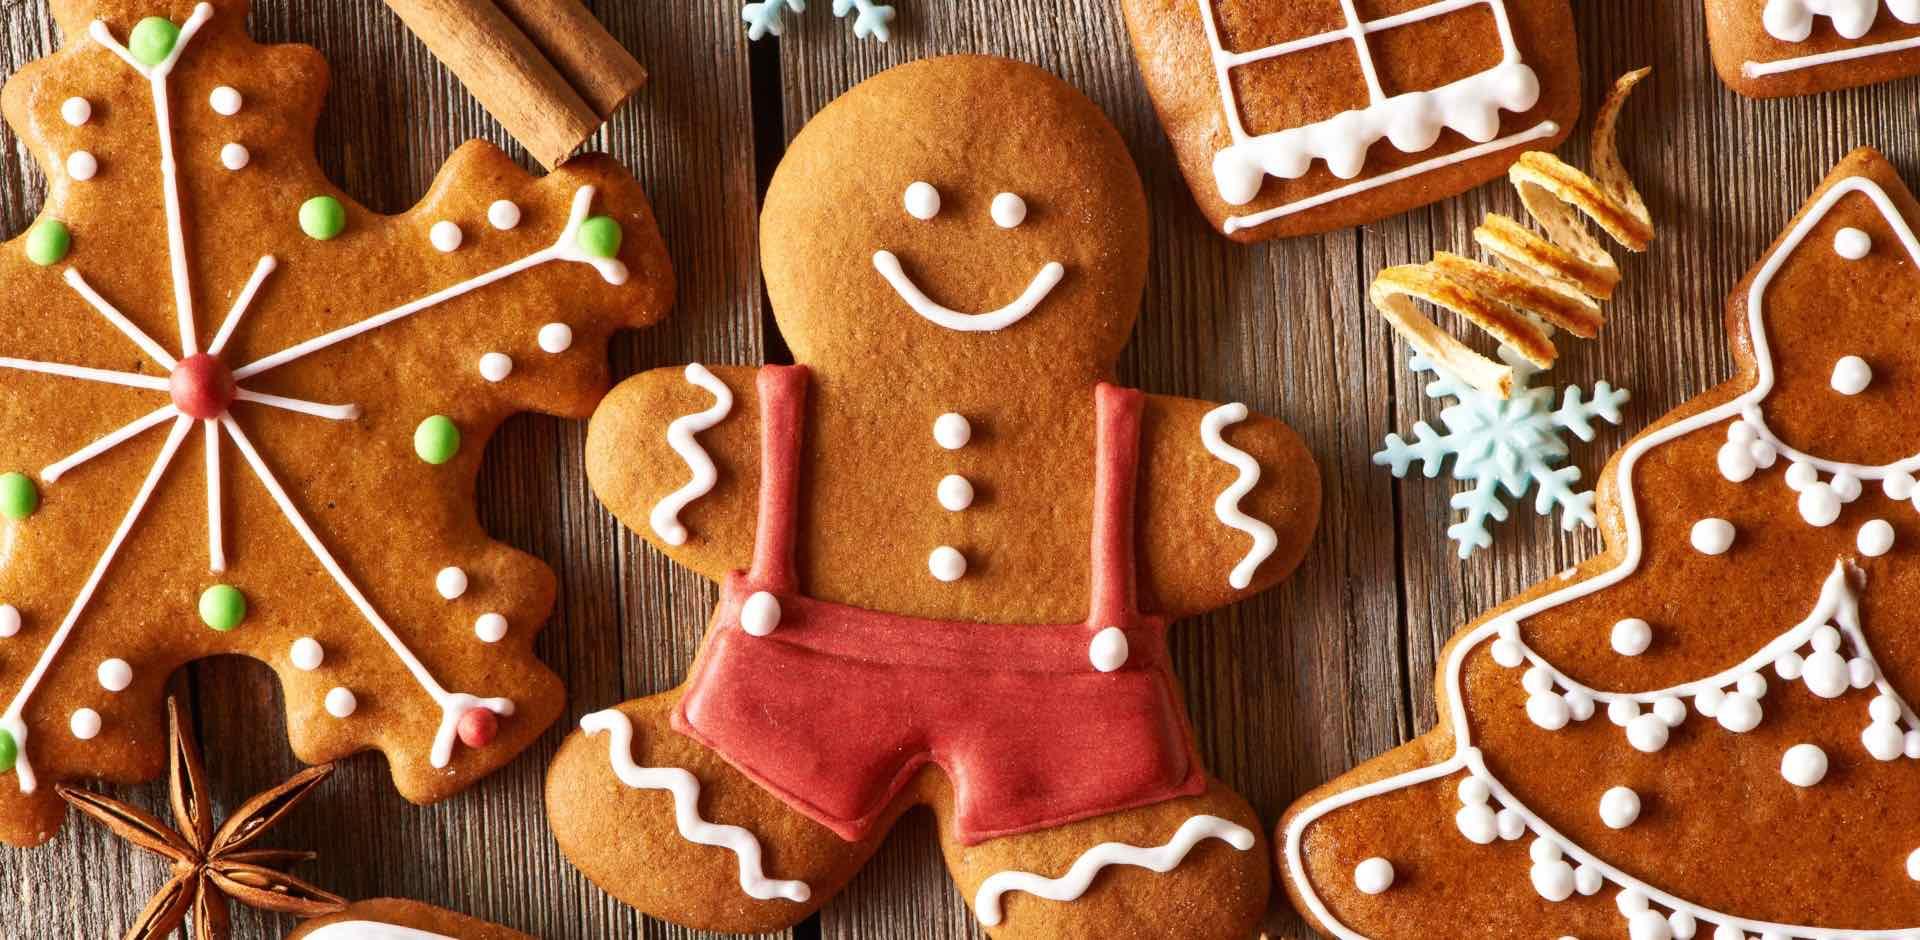 Natale - omino - panpepato - Gustorotondo - spesa online